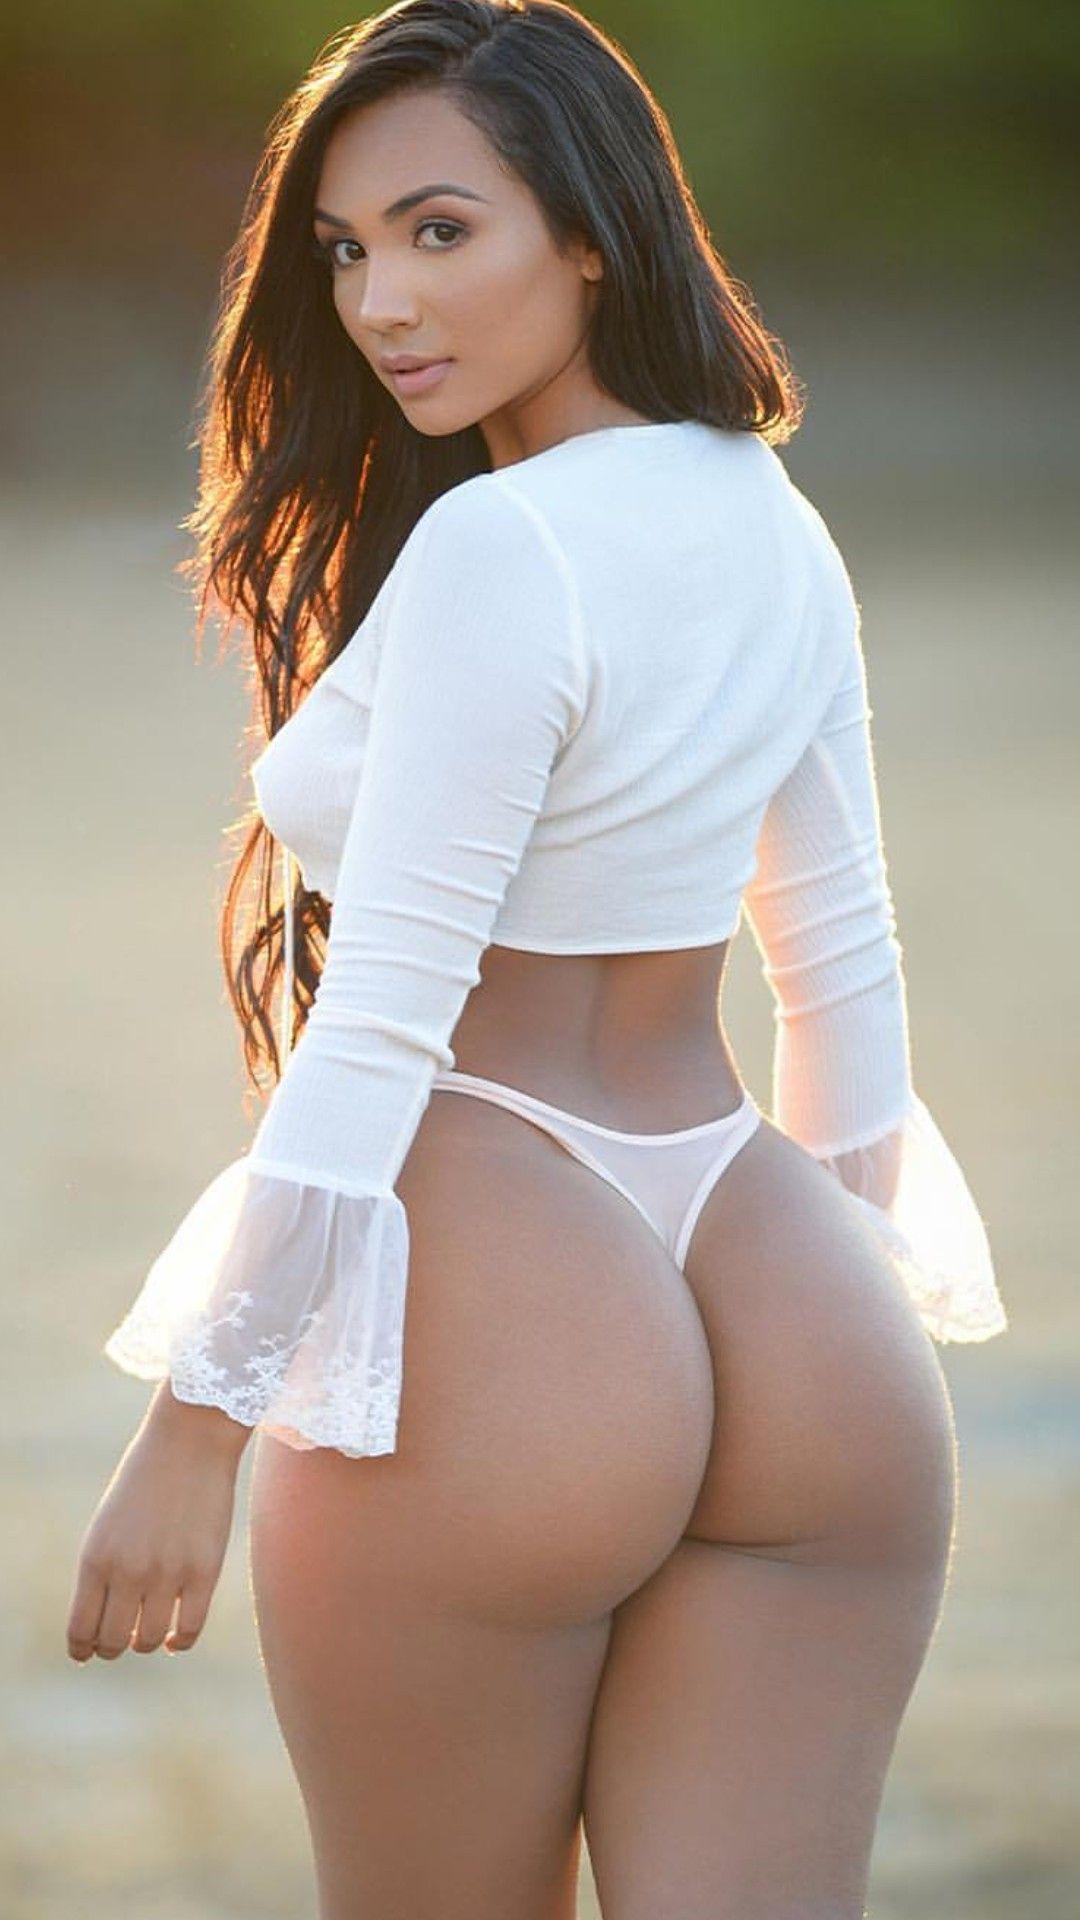 camila bernal | duże cycuszki | pinterest | curves, curvy and